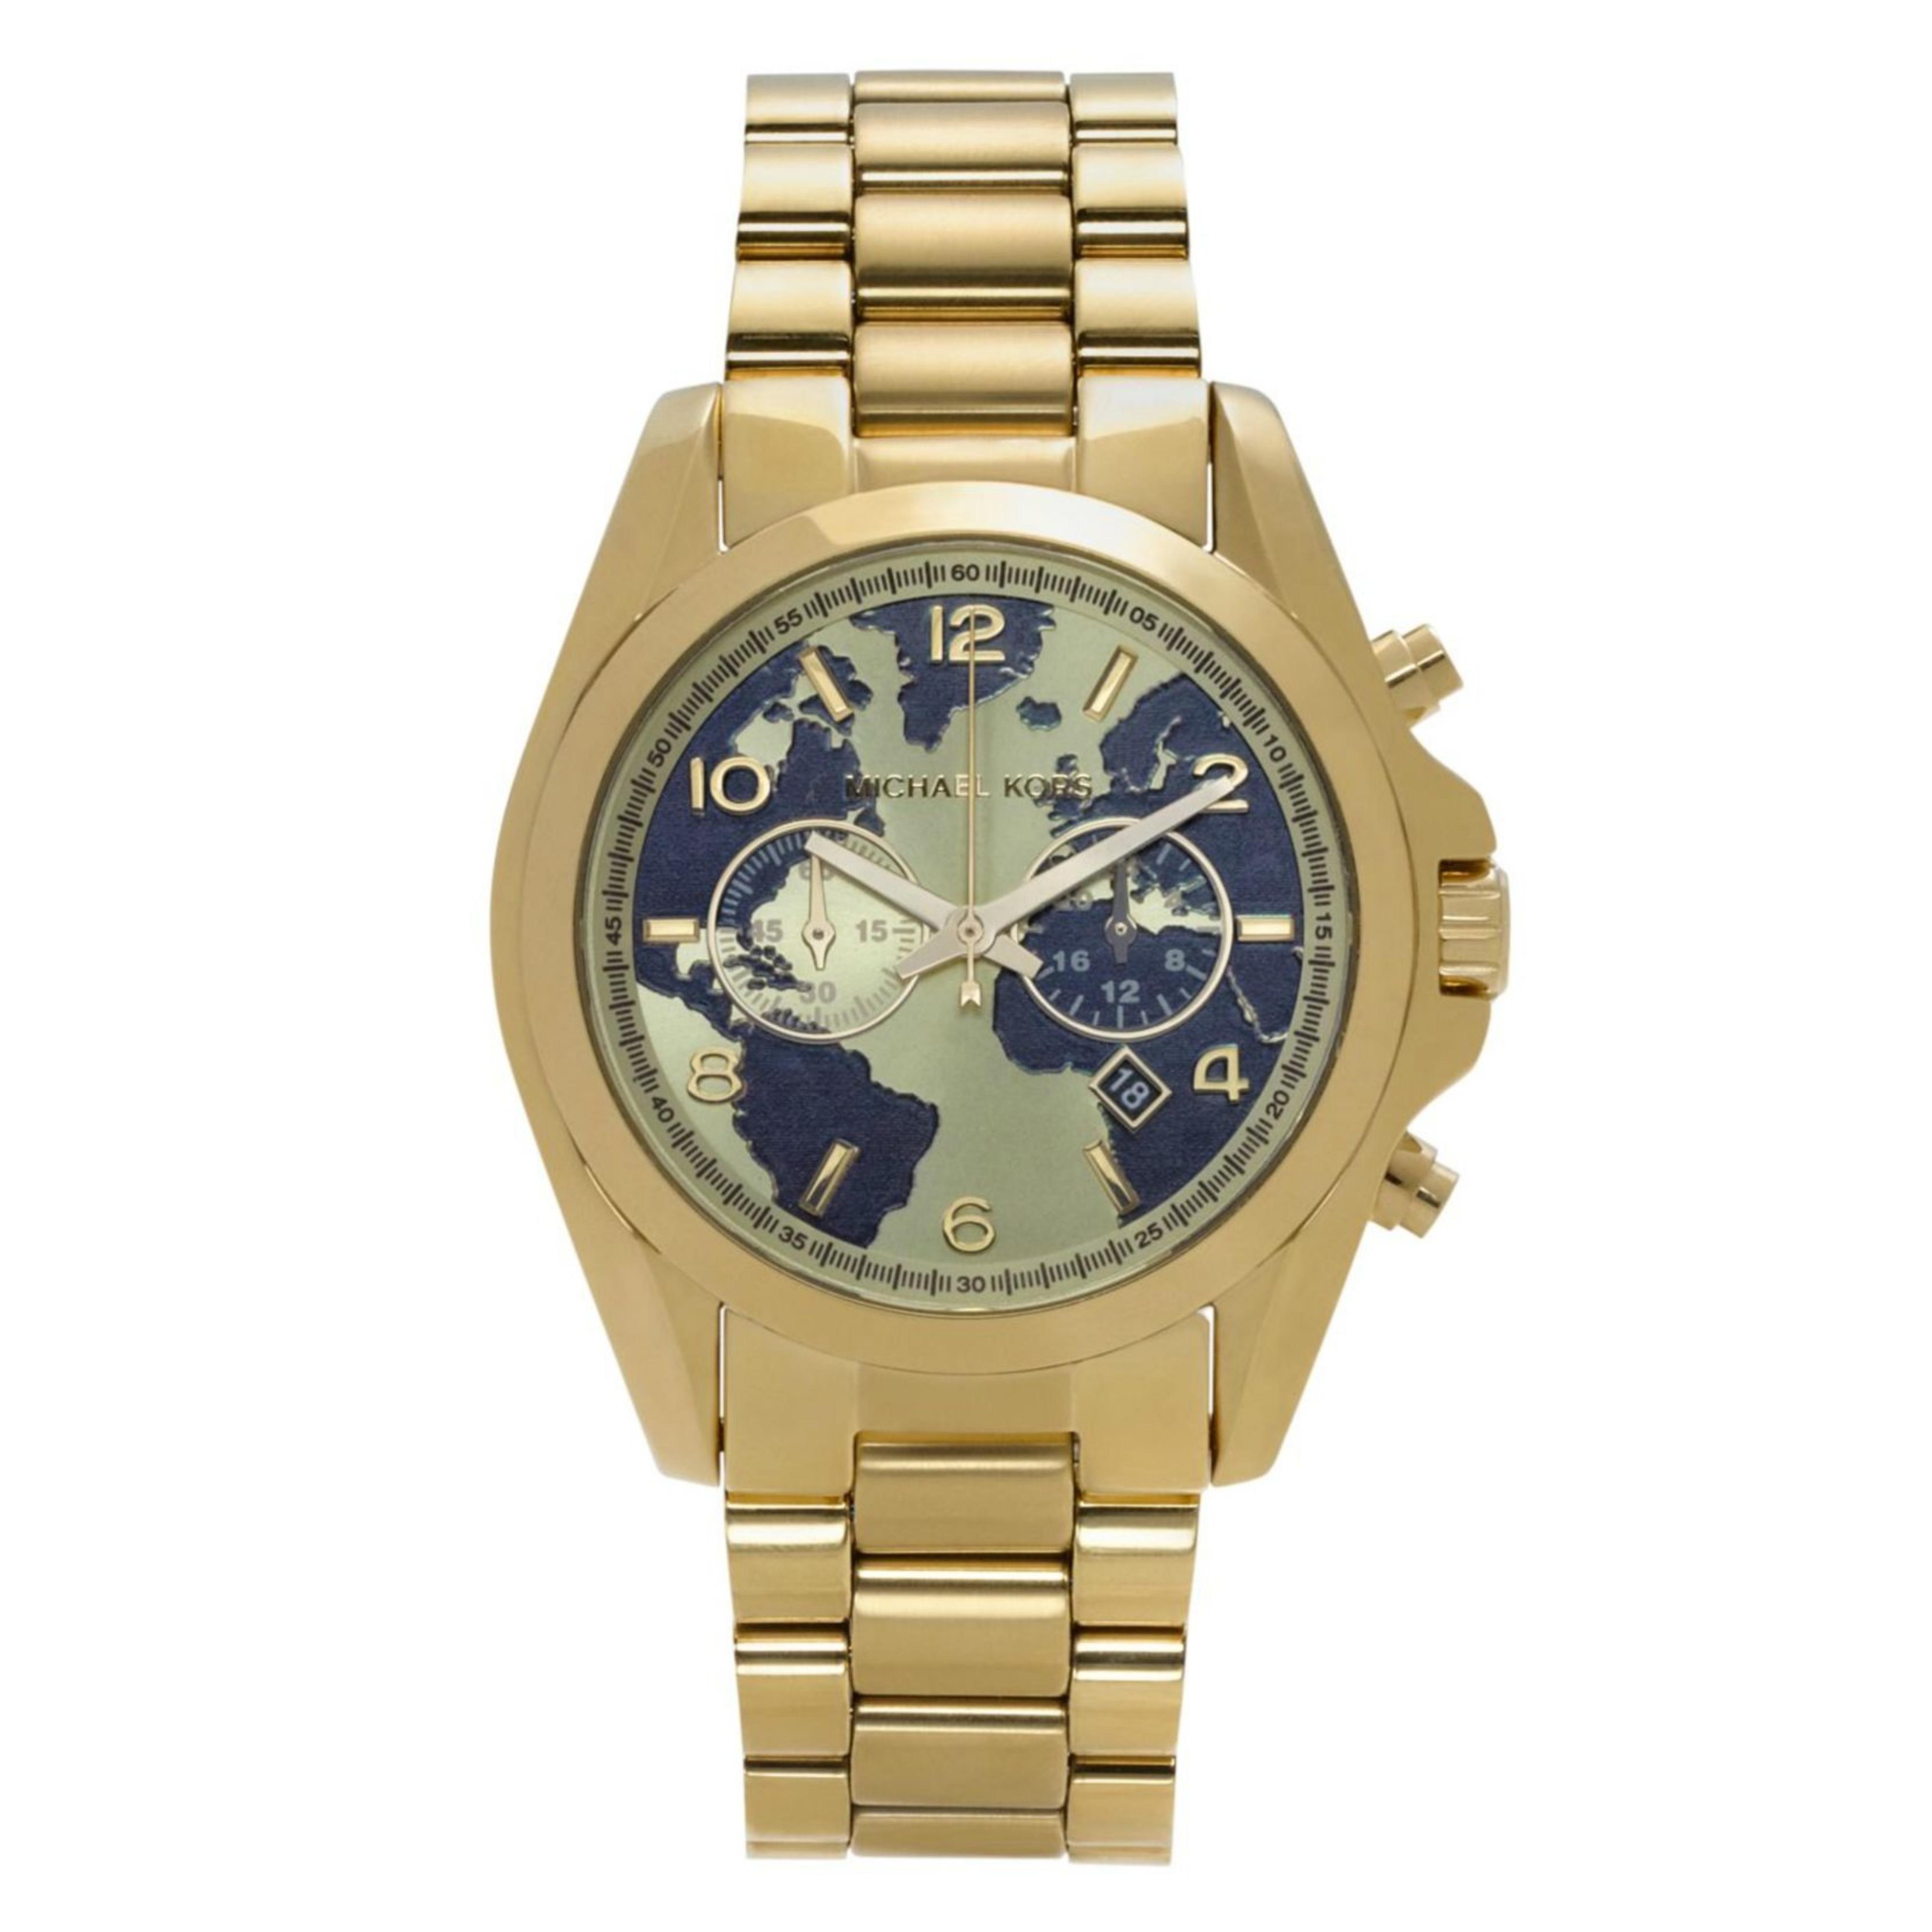 04c3ba655fcb Sentinel Michael Kors Hunger Stop Bradshaw Watch 6272│Round Dial│Gold Tone  Bracelet Band